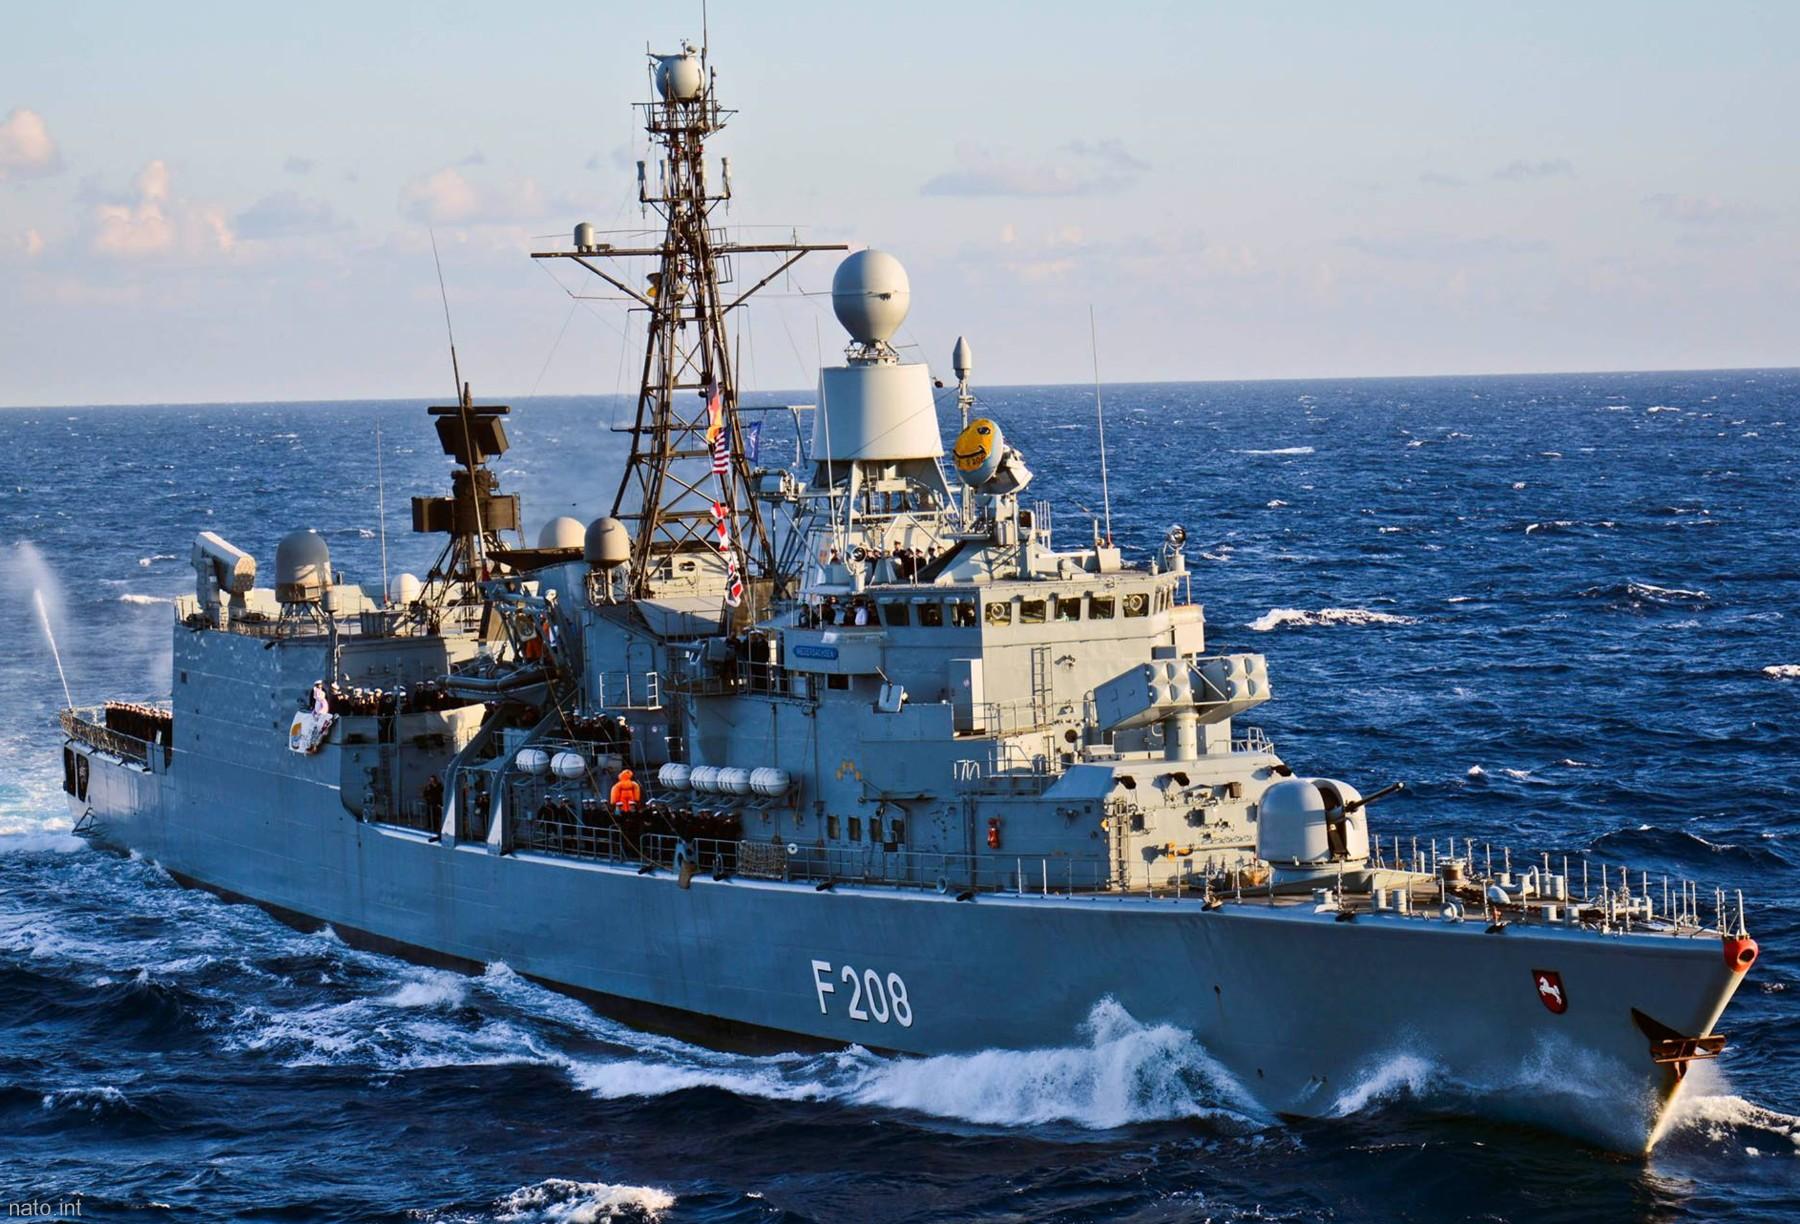 fgs niedersachsen f 208 type 122 class frigate german navy. Black Bedroom Furniture Sets. Home Design Ideas